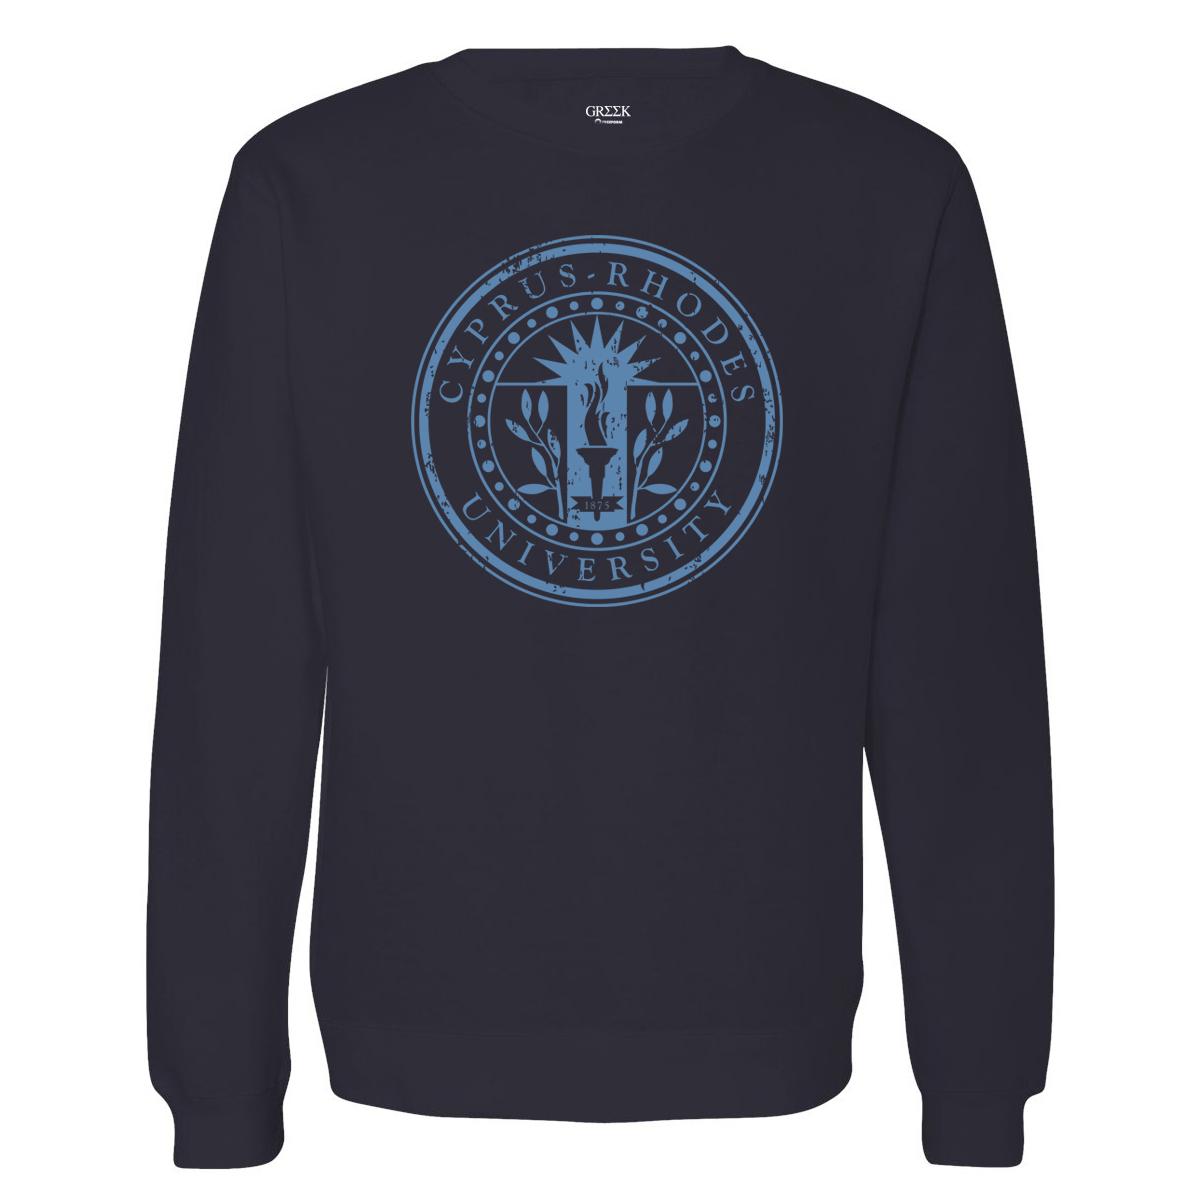 Greek Cyprus Rhodes University Crewneck Sweatshirt